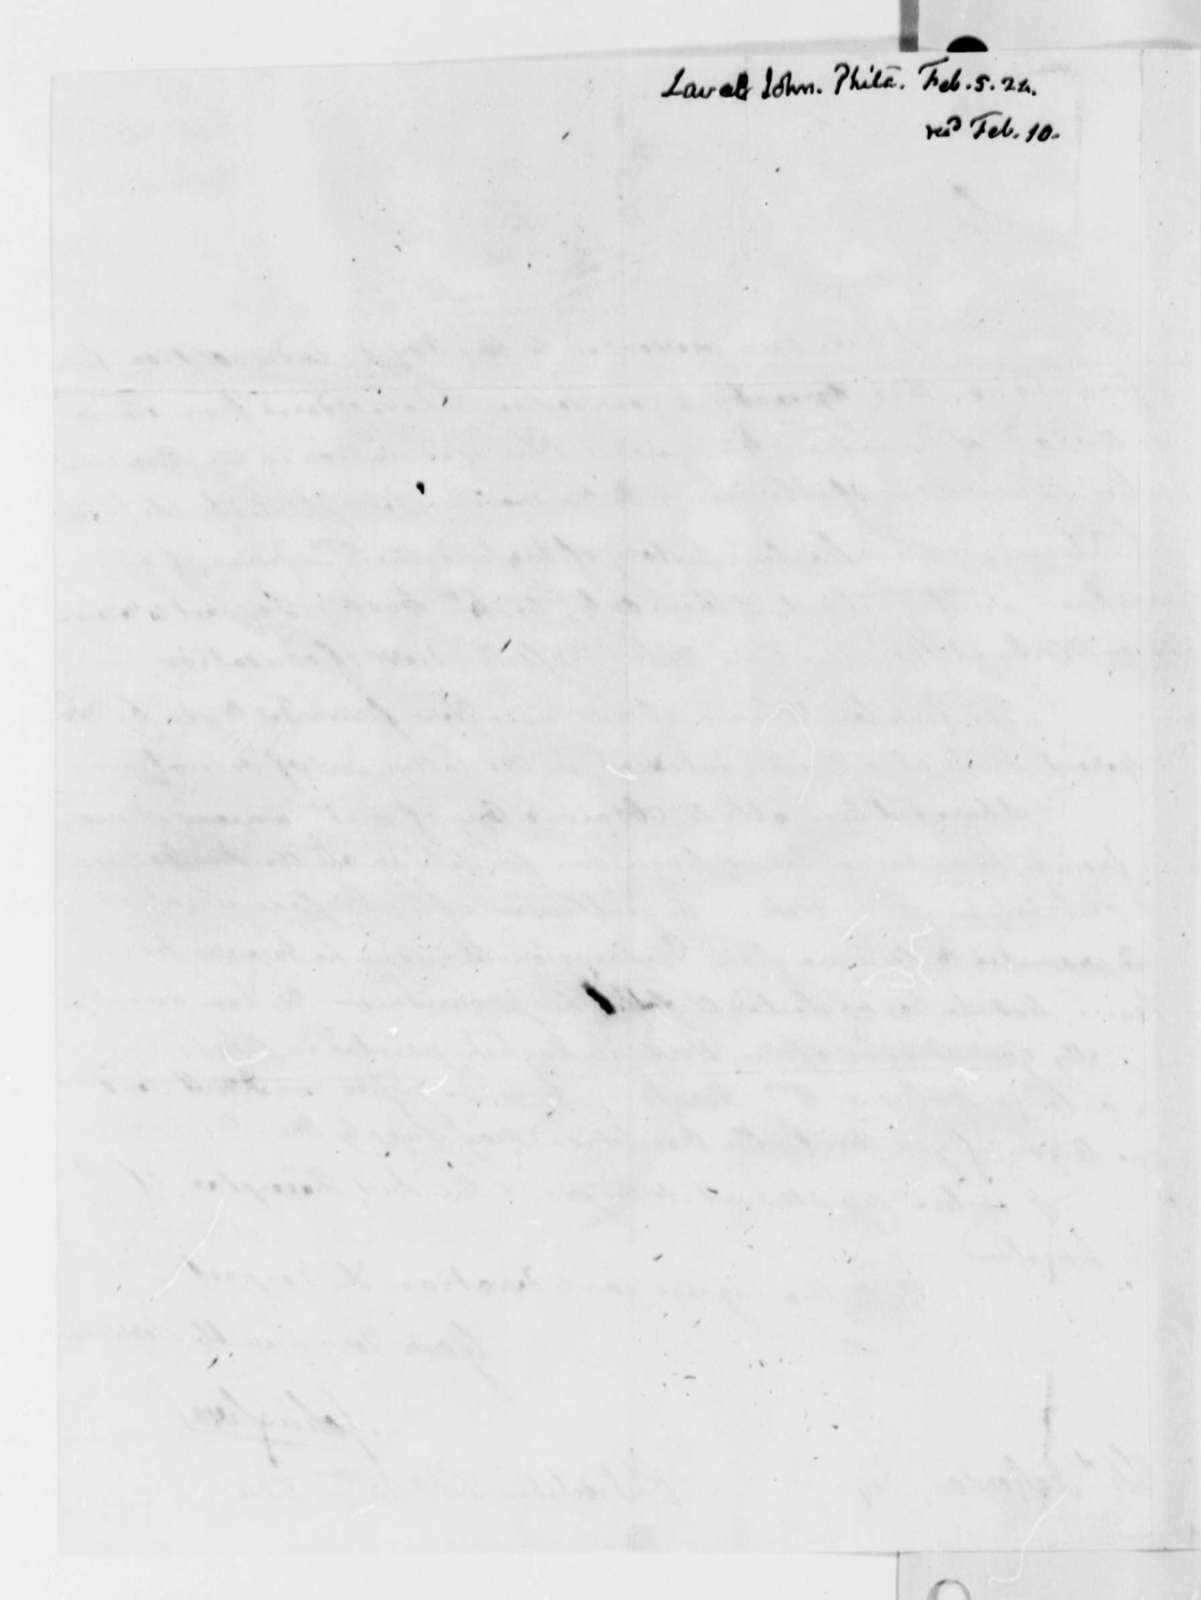 John Laval to Thomas Jefferson, February 5, 1824